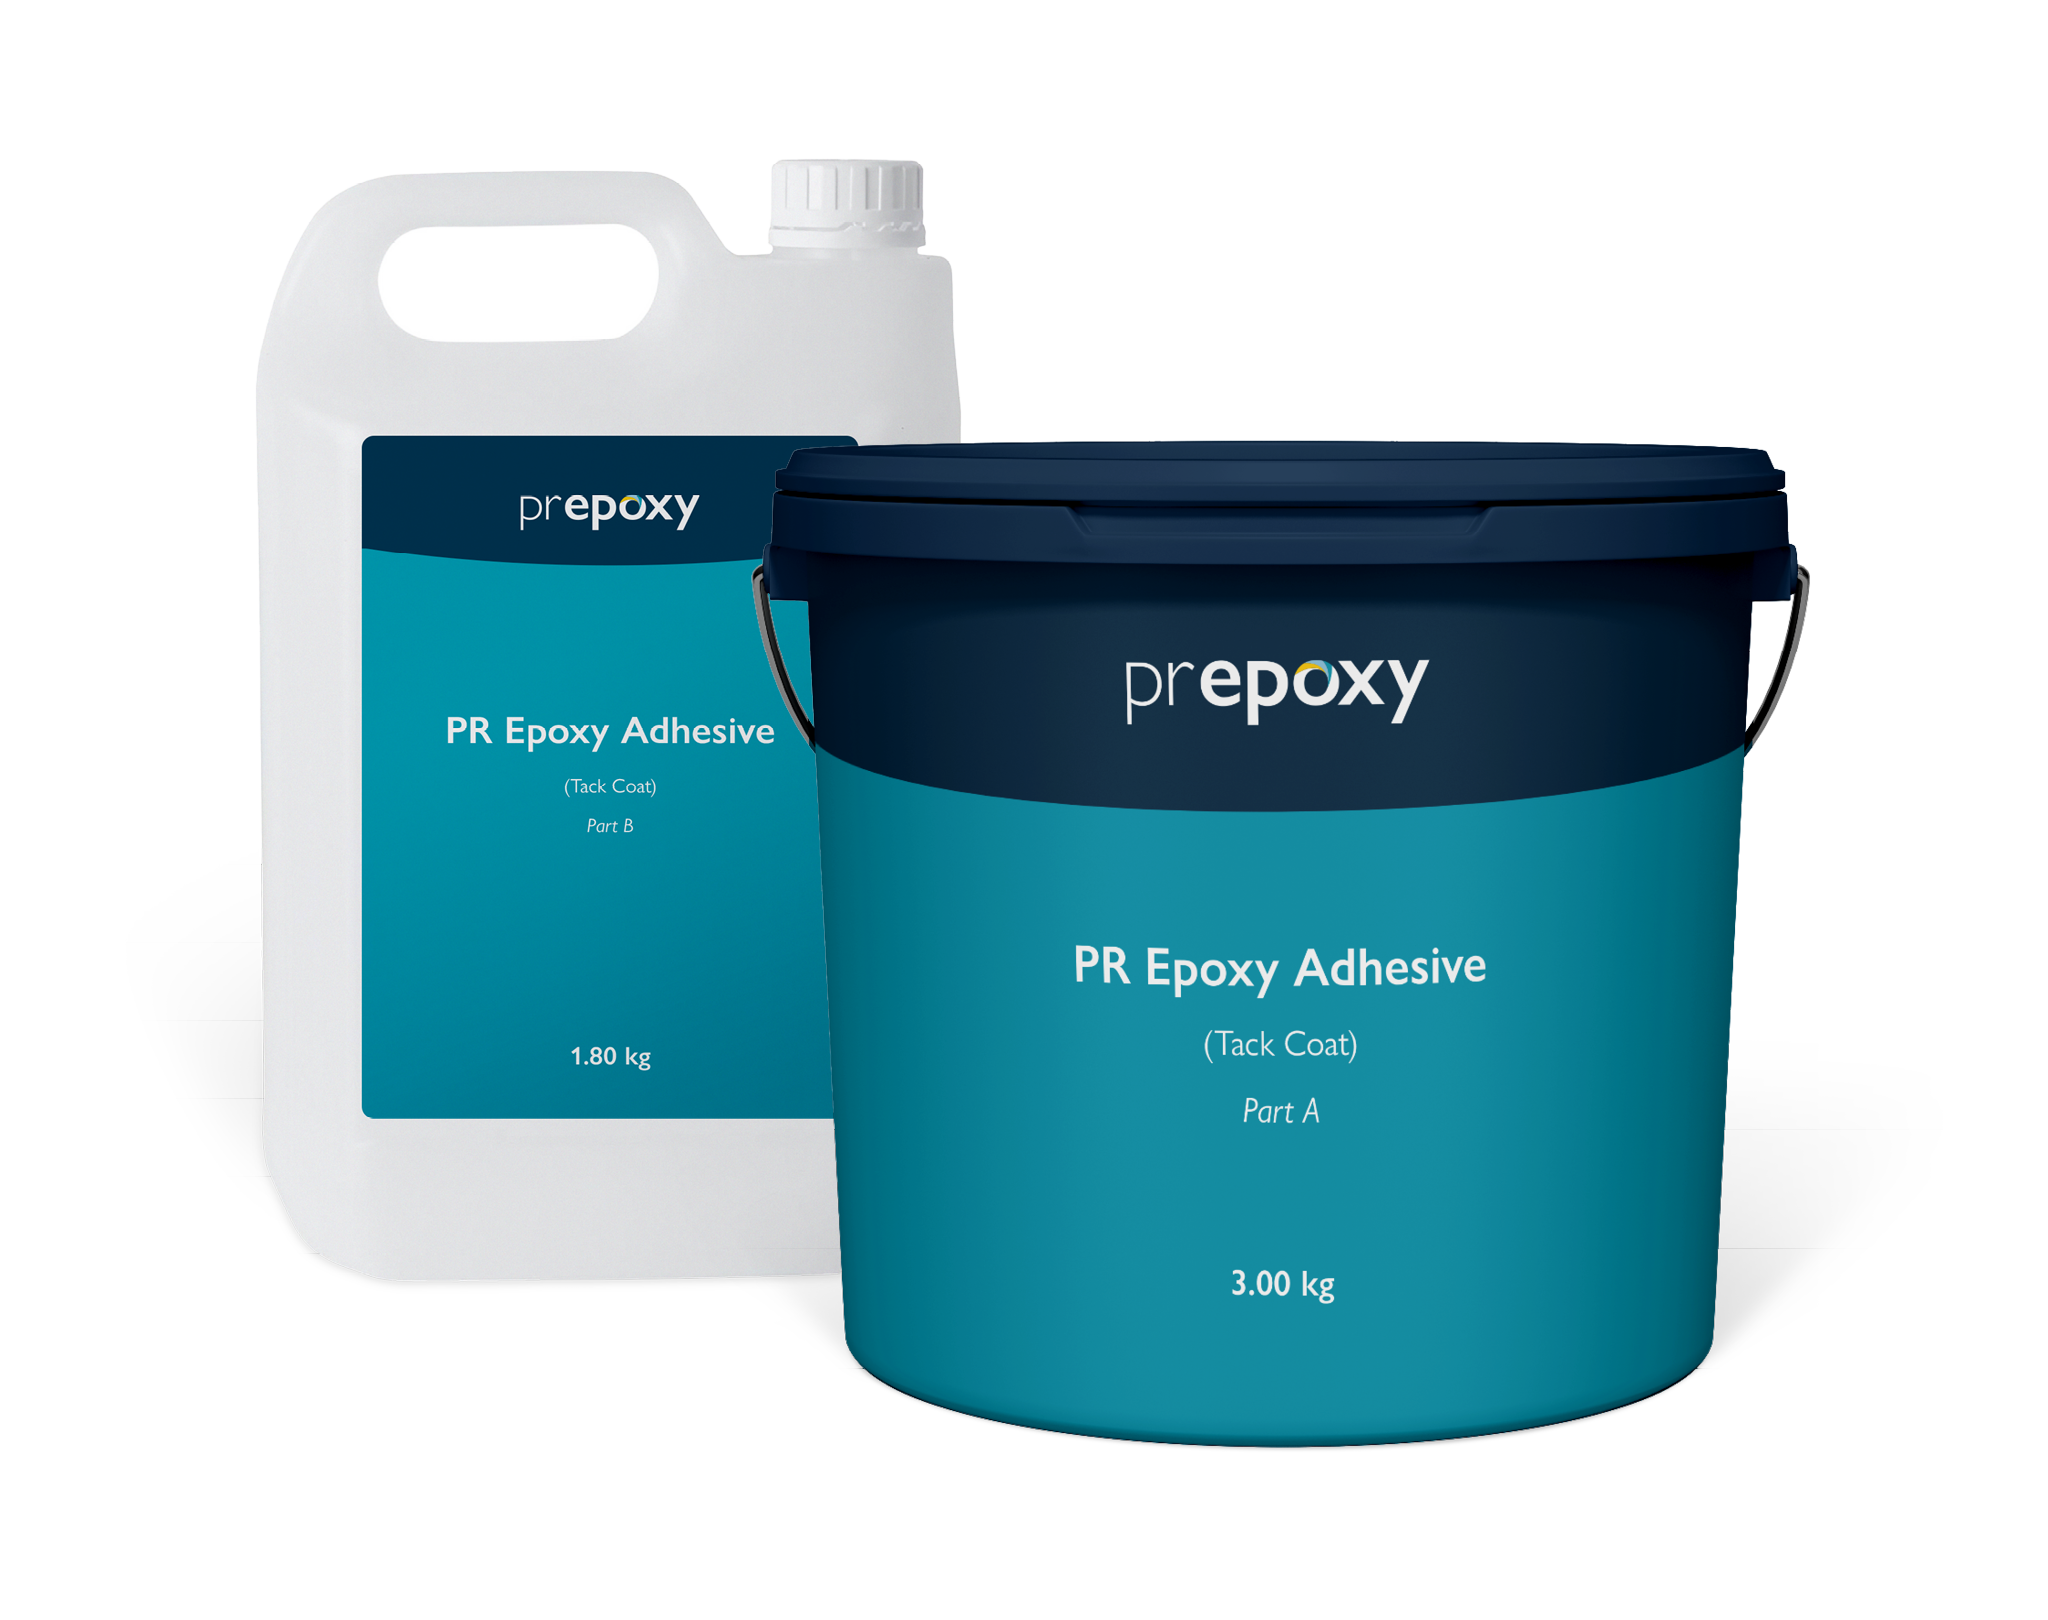 PR Epoxy Adhesive (Tack Coat)